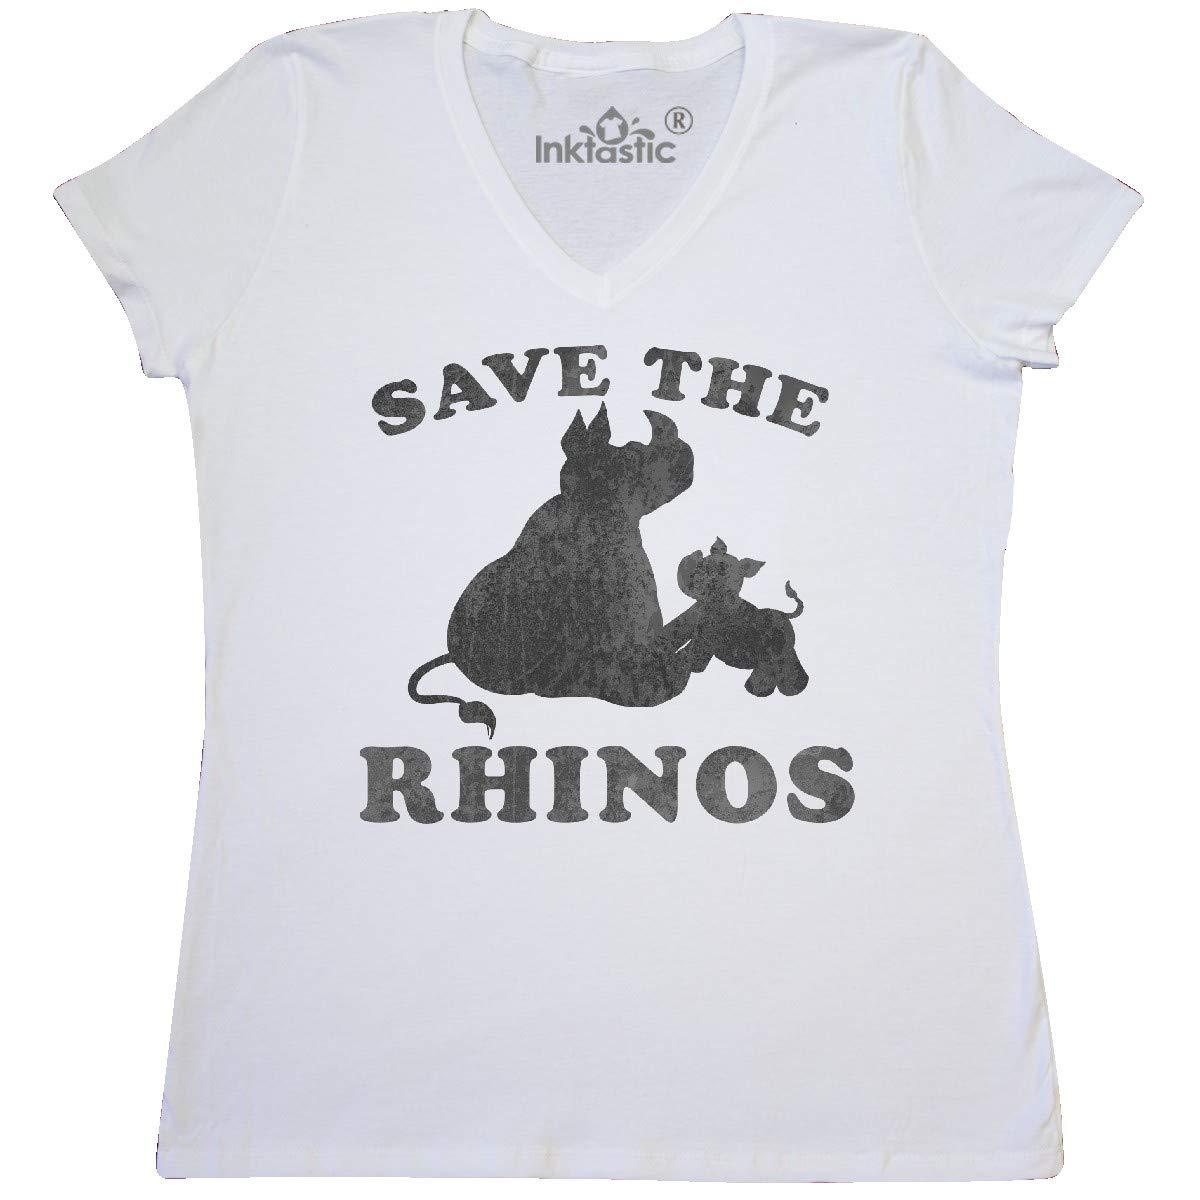 Inktastic Save The Rhinos With Cute Rhinos Women S Shirts